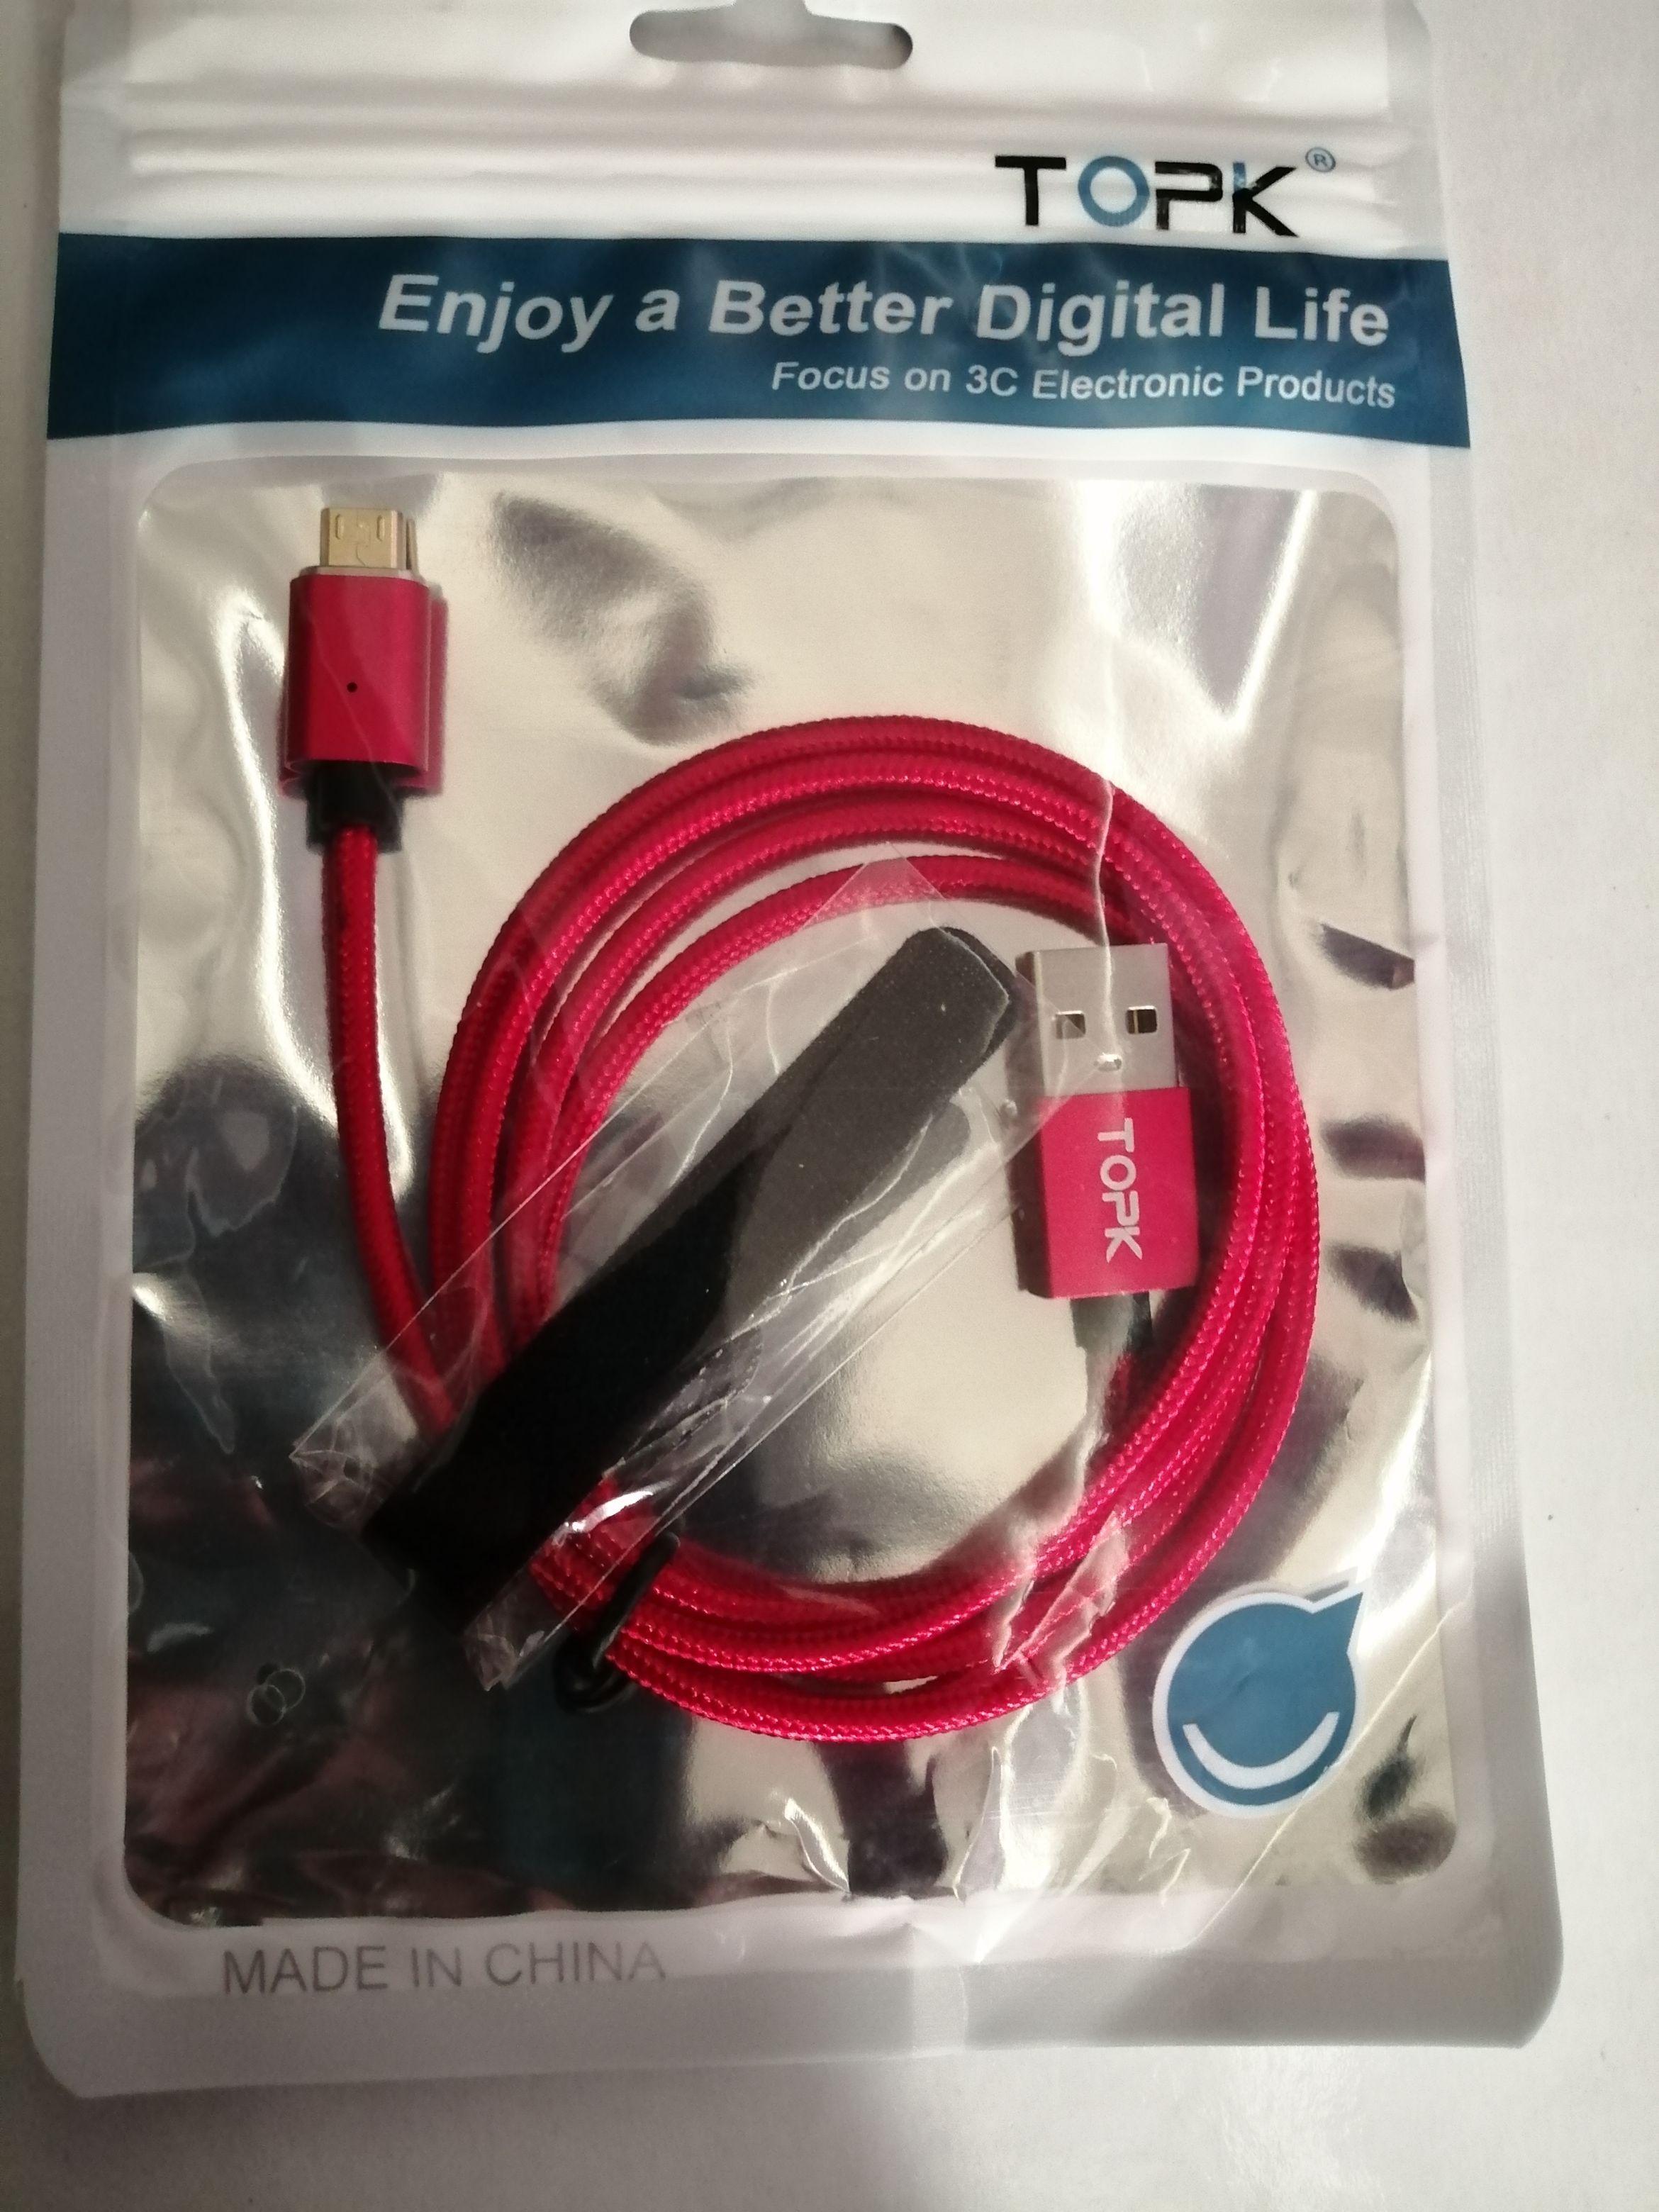 TOPK F Line1 Magnetic Micro USB Cable LED Indicator Upgraded Nylon Braided Data Sync USB Charger Cable for Micro USB Port|cable for|cable for micro usb|usb cable led - AliExpress